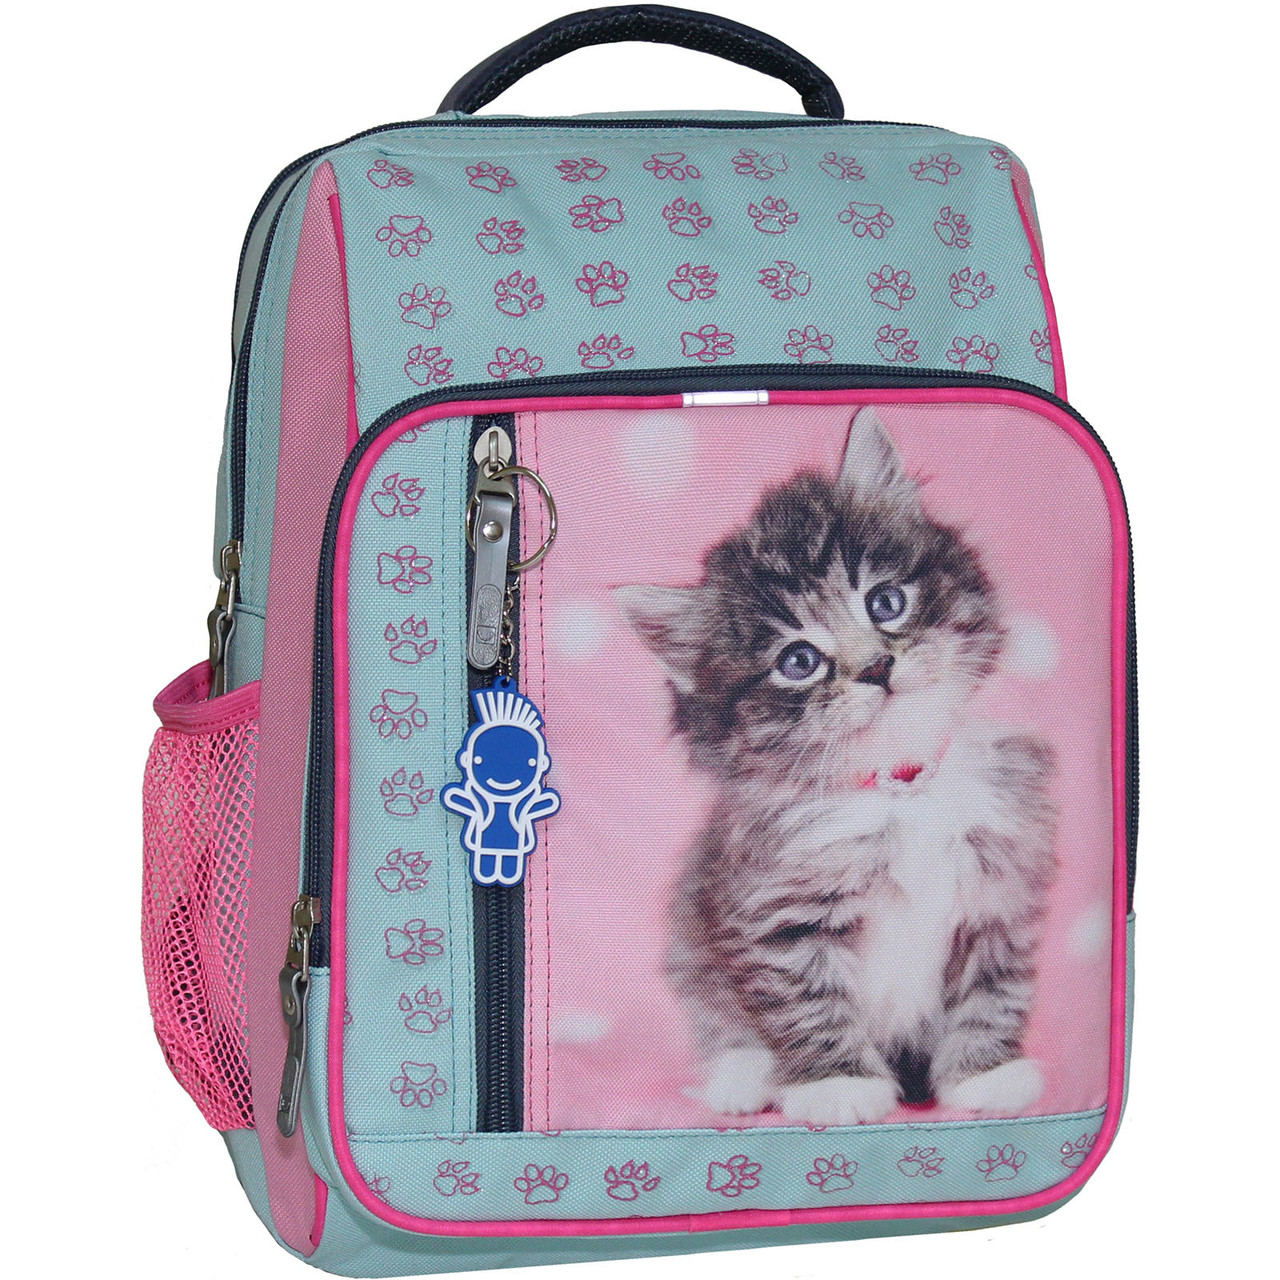 Рюкзак для девочки Bagland Школьник 8 л. тиффани 65д (00112662)